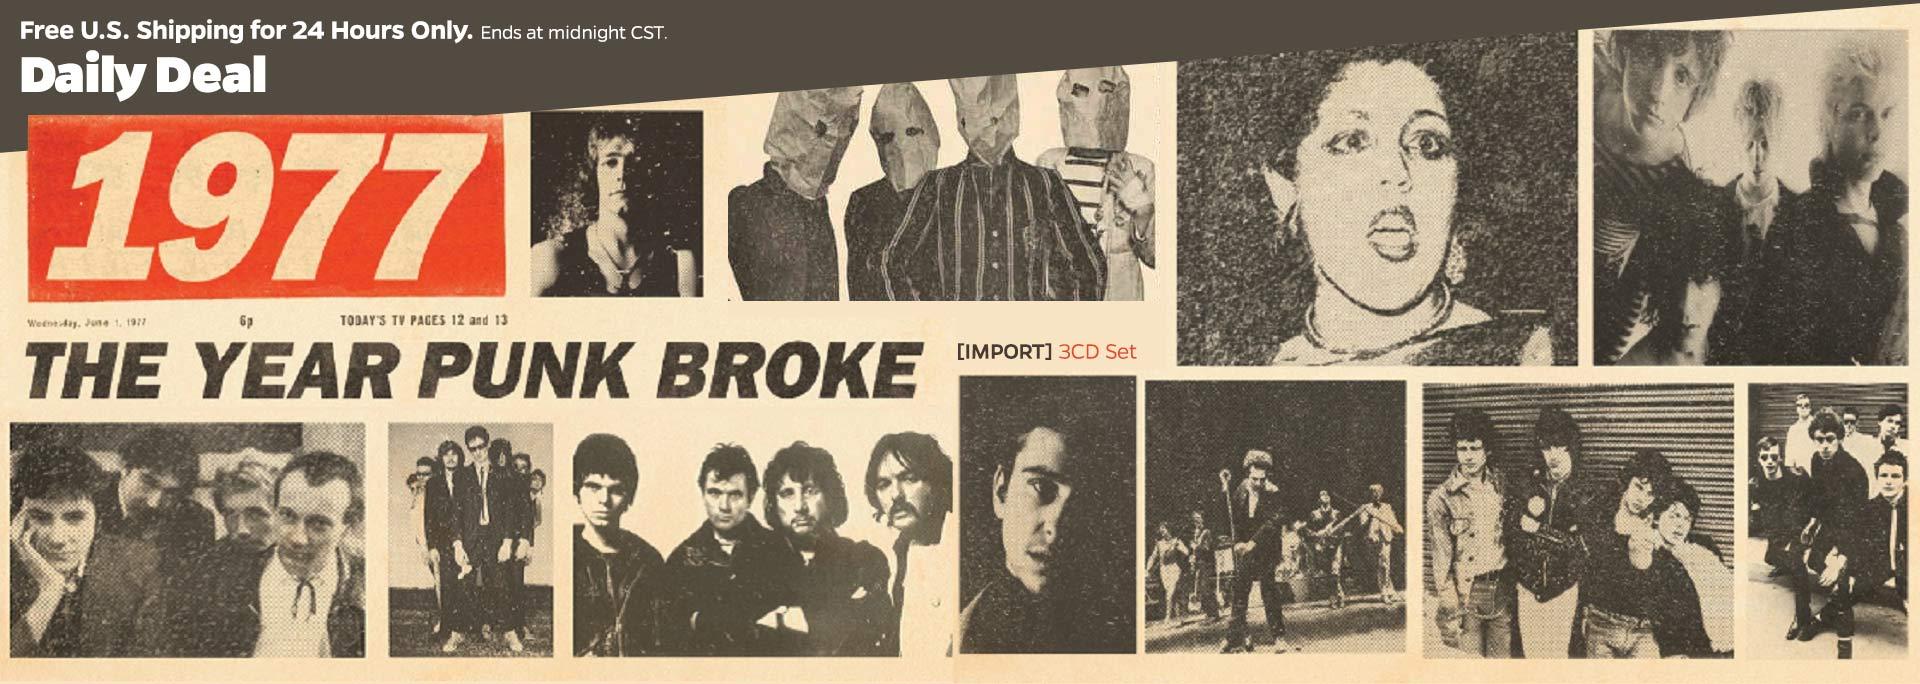 THe YEar Punk Broke 1977